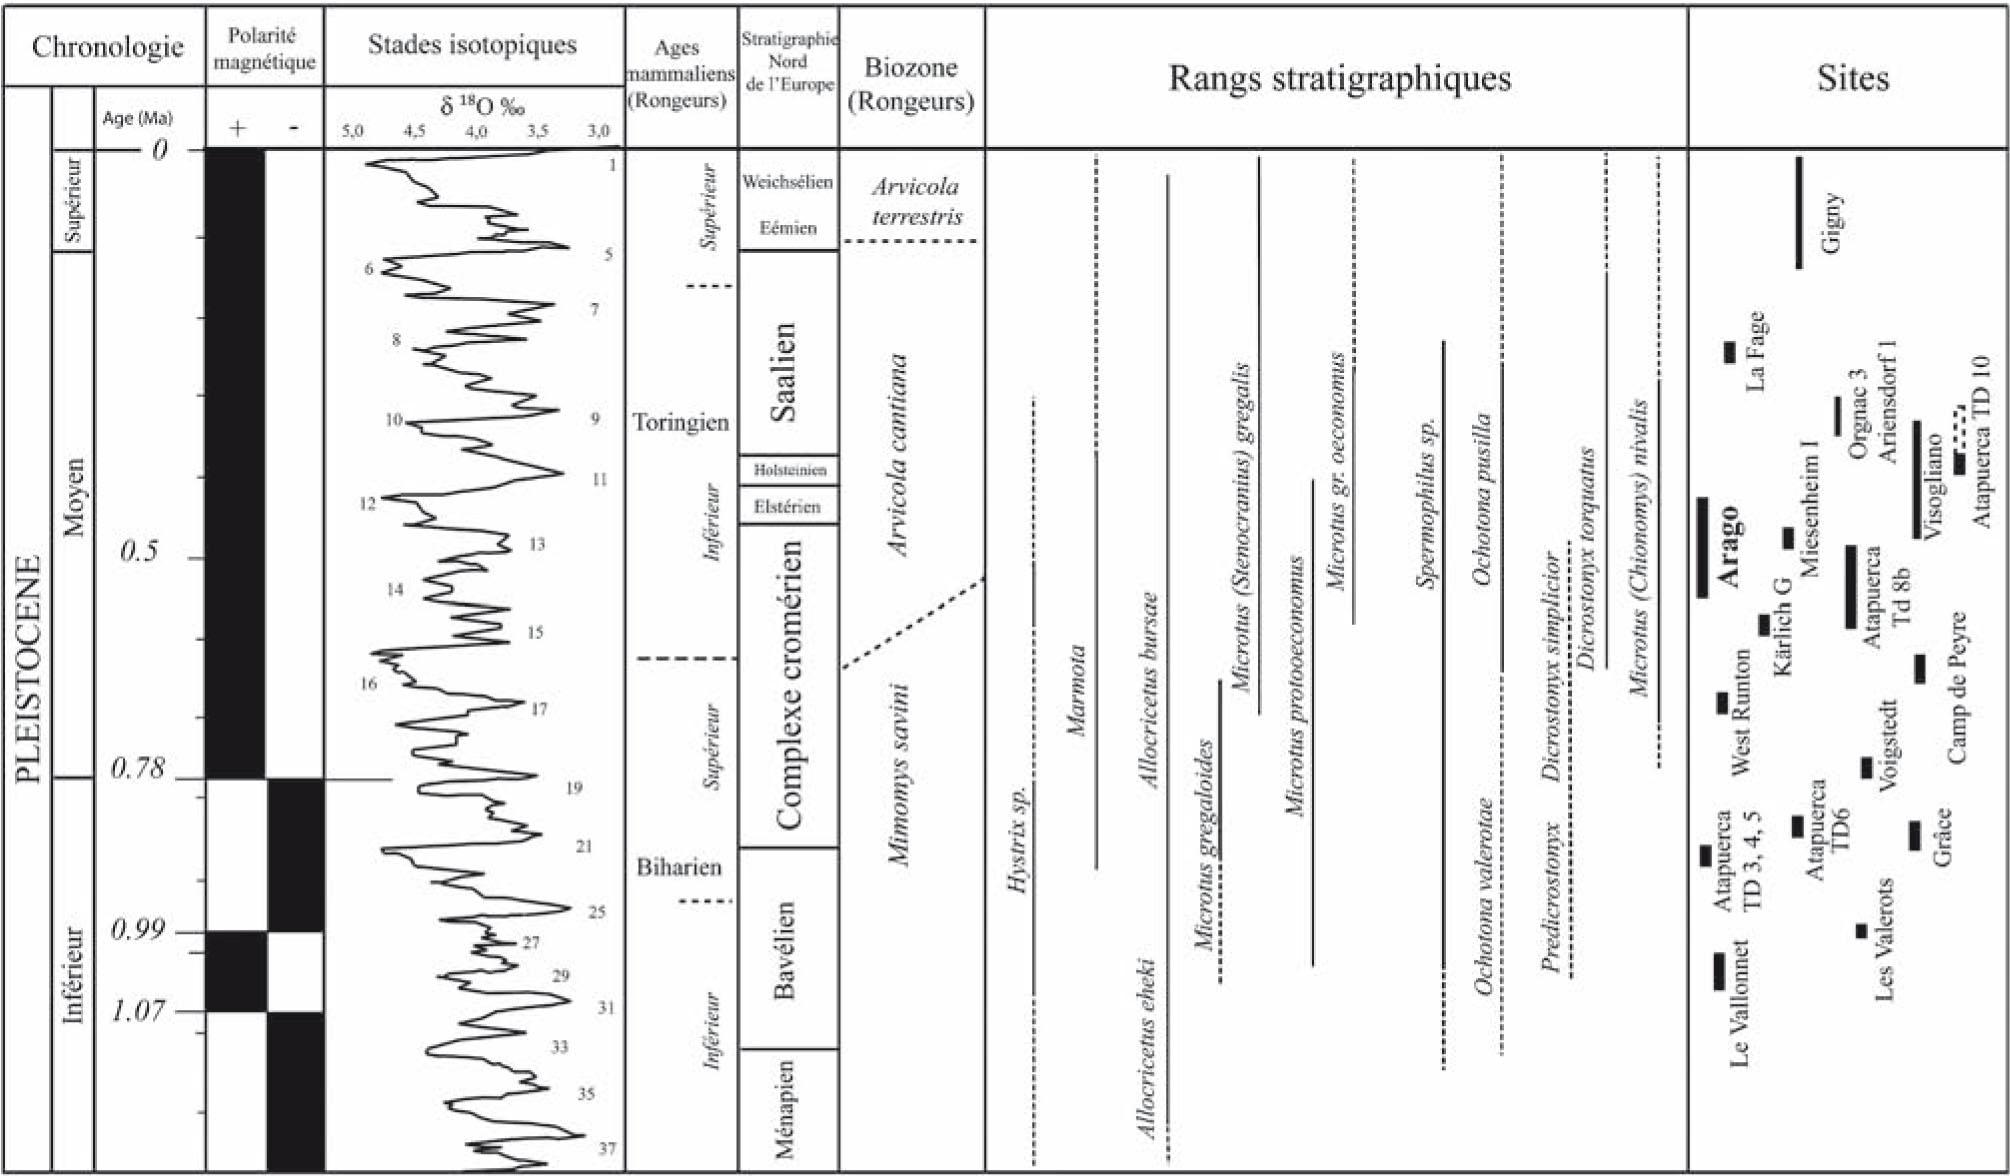 Dating quaternaire sedimenten P2P matchmaking